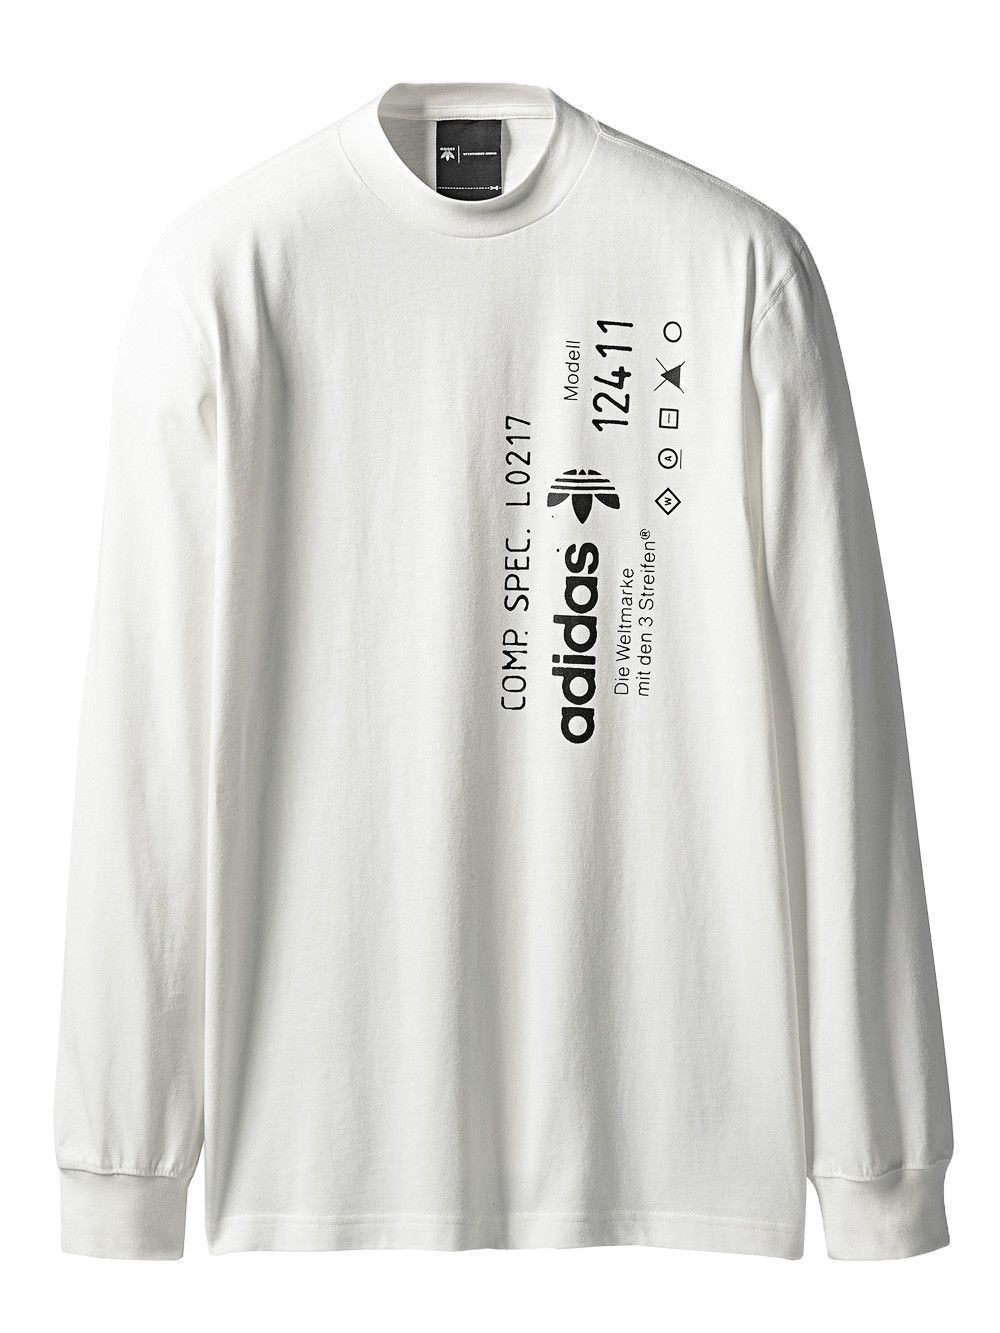 f5dd4d6a ADIDAS ORIGINALS BY ALEXANDER WANG . #adidasoriginalsbyalexanderwang #cloth  #